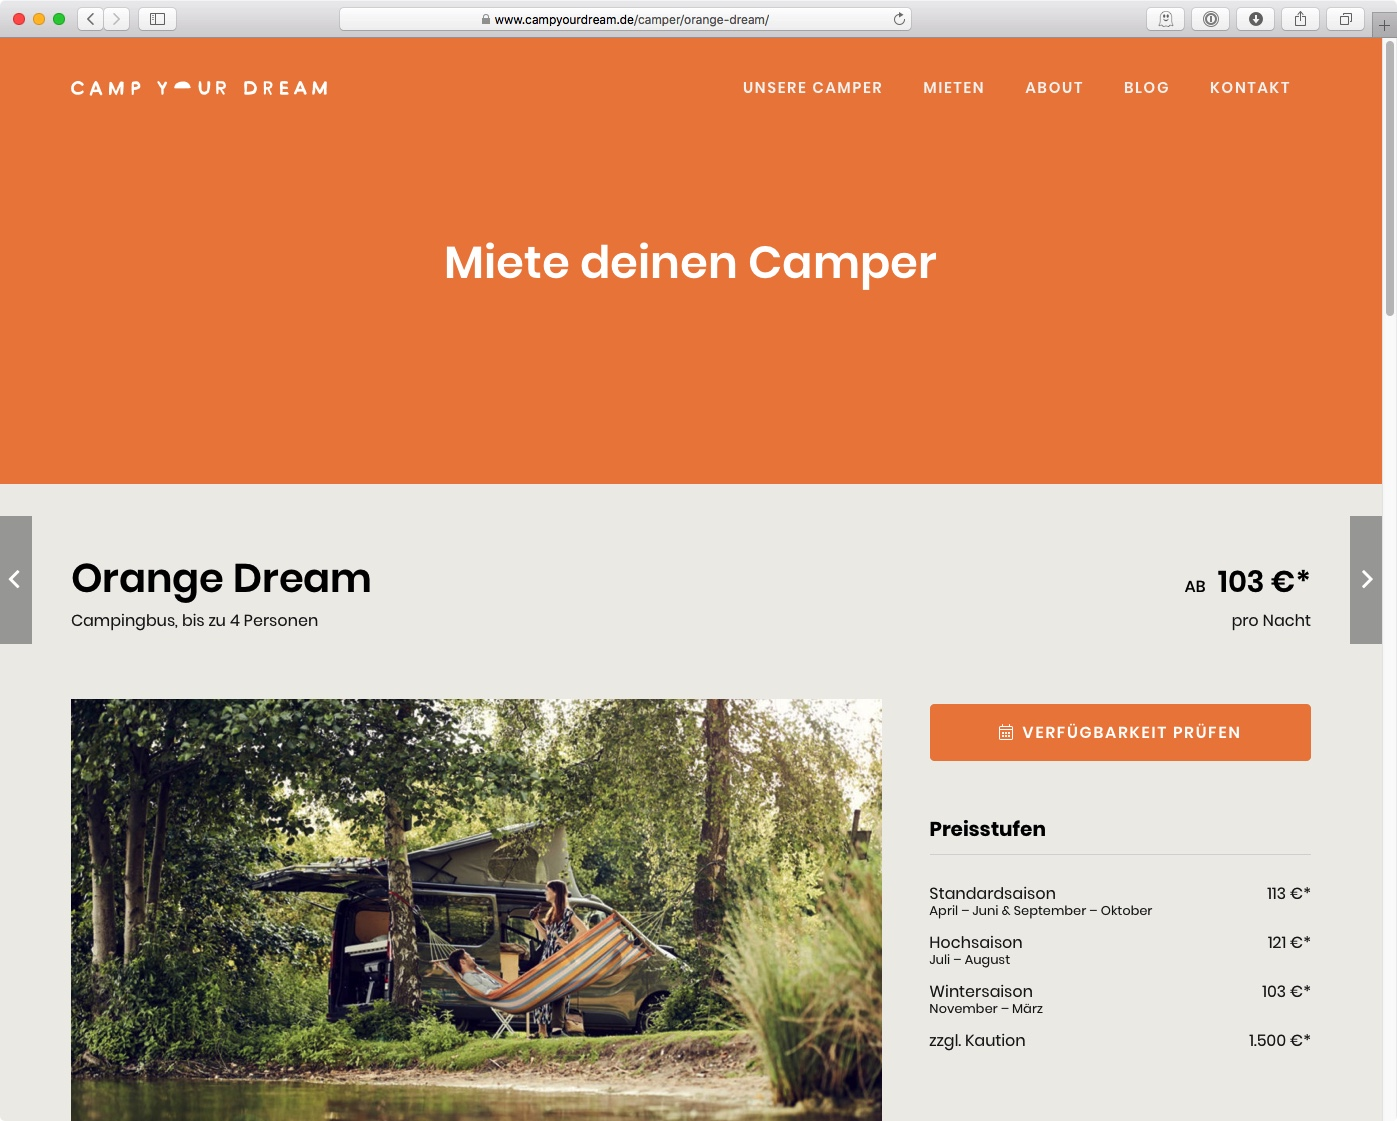 CAMP YOUR DREAM - Orange-Dream (Farbkonzept)